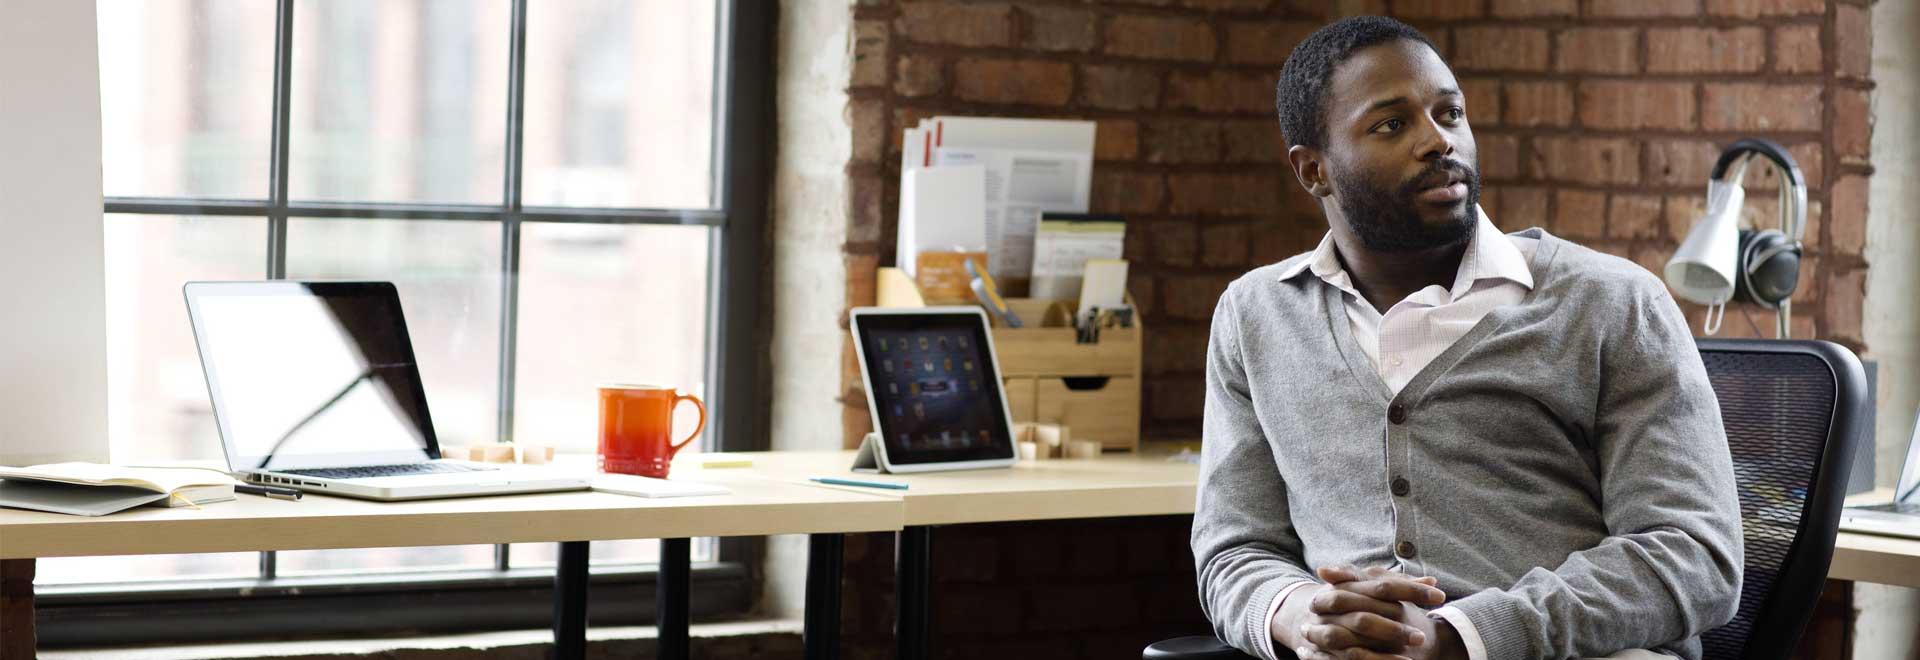 acheter microsoft office 365 business premium tpe pme. Black Bedroom Furniture Sets. Home Design Ideas